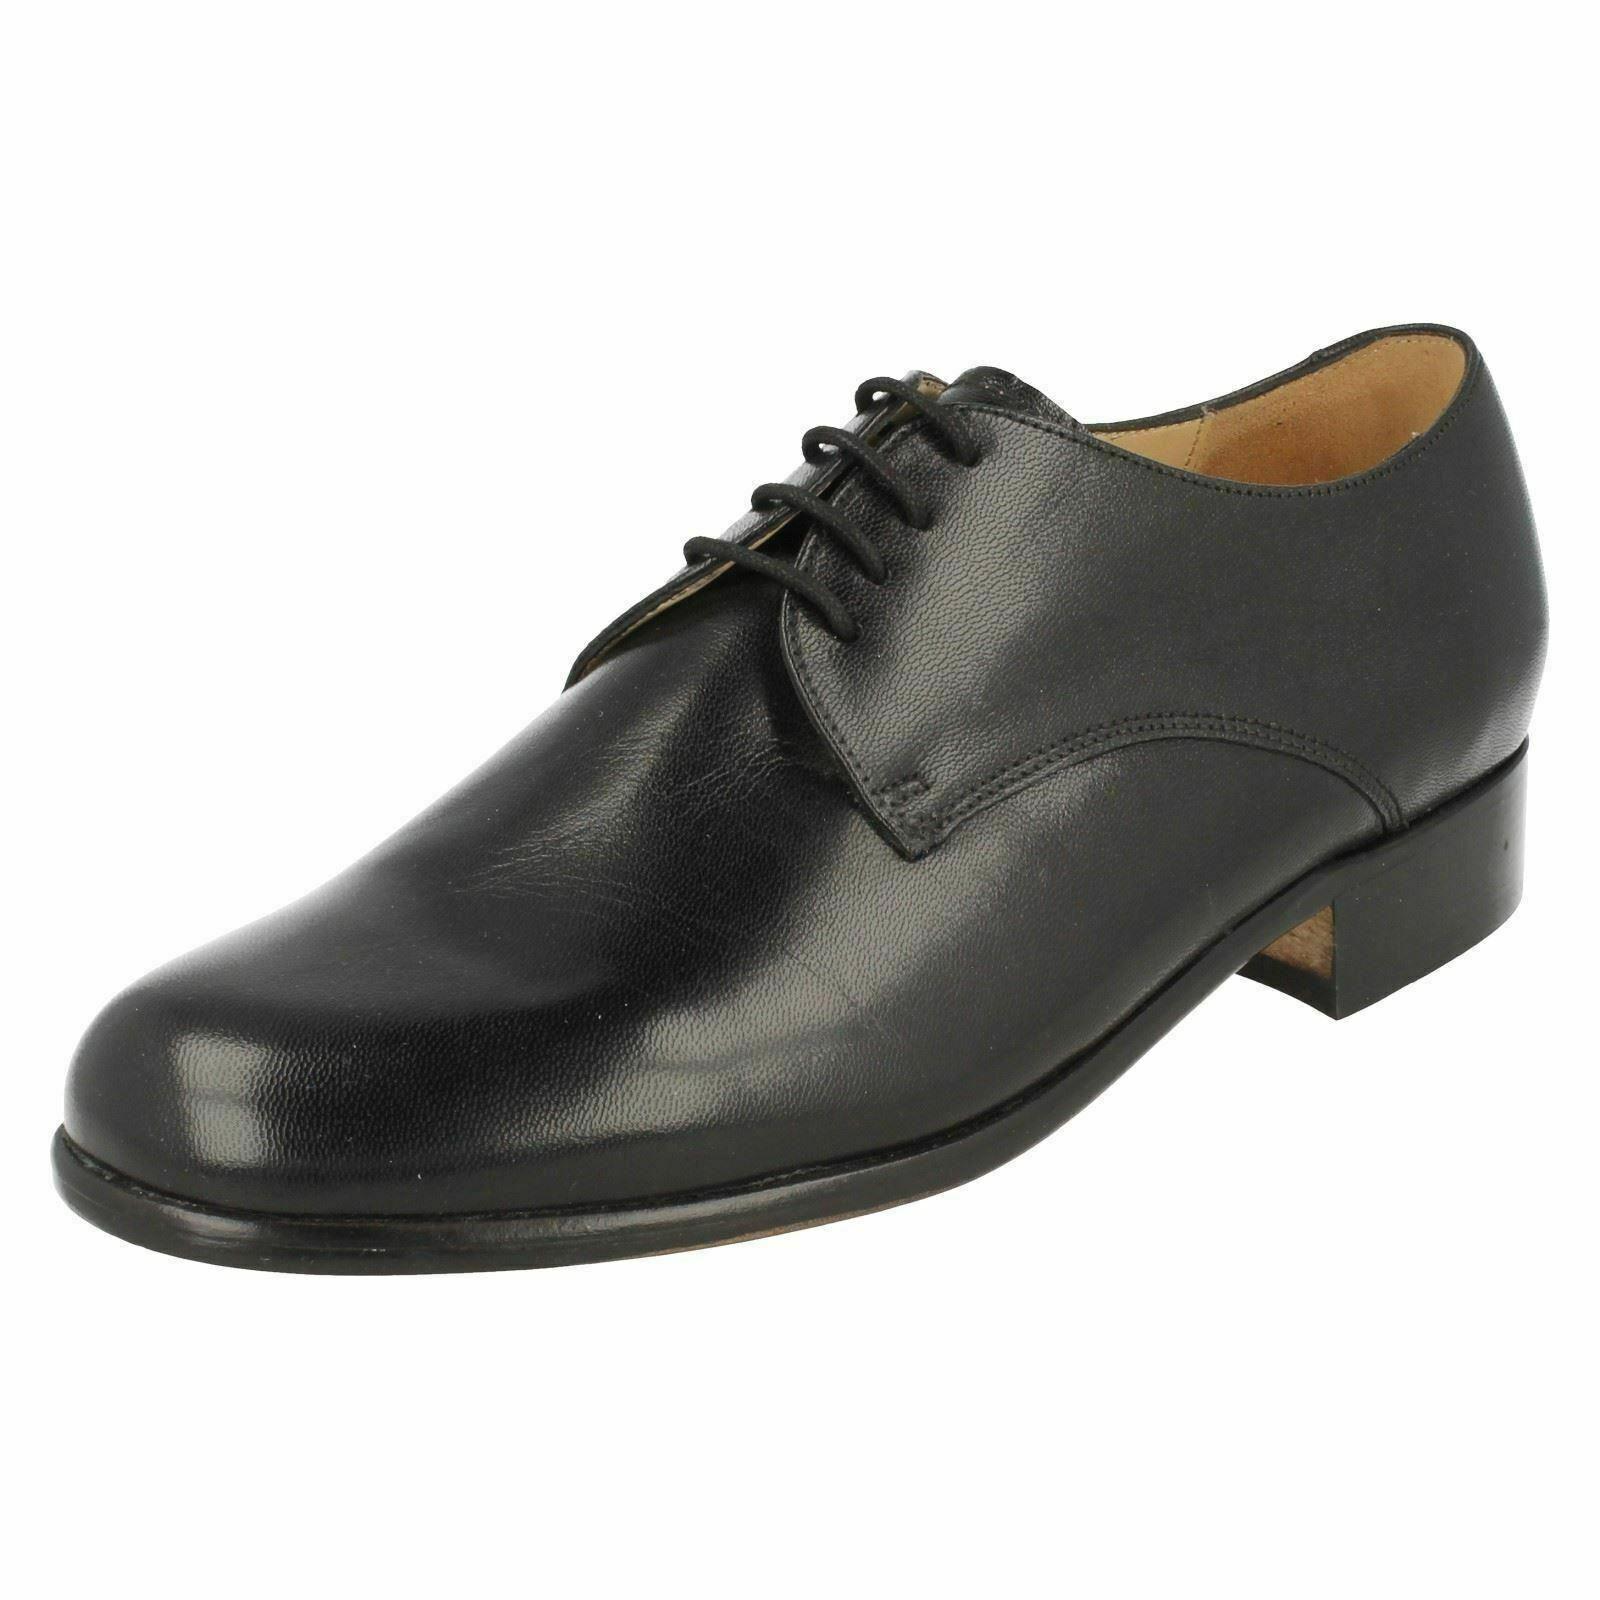 Homme Noir Formelles Lacet GRENSON Cuir Formelle Chaussures Style-Temple MEADS